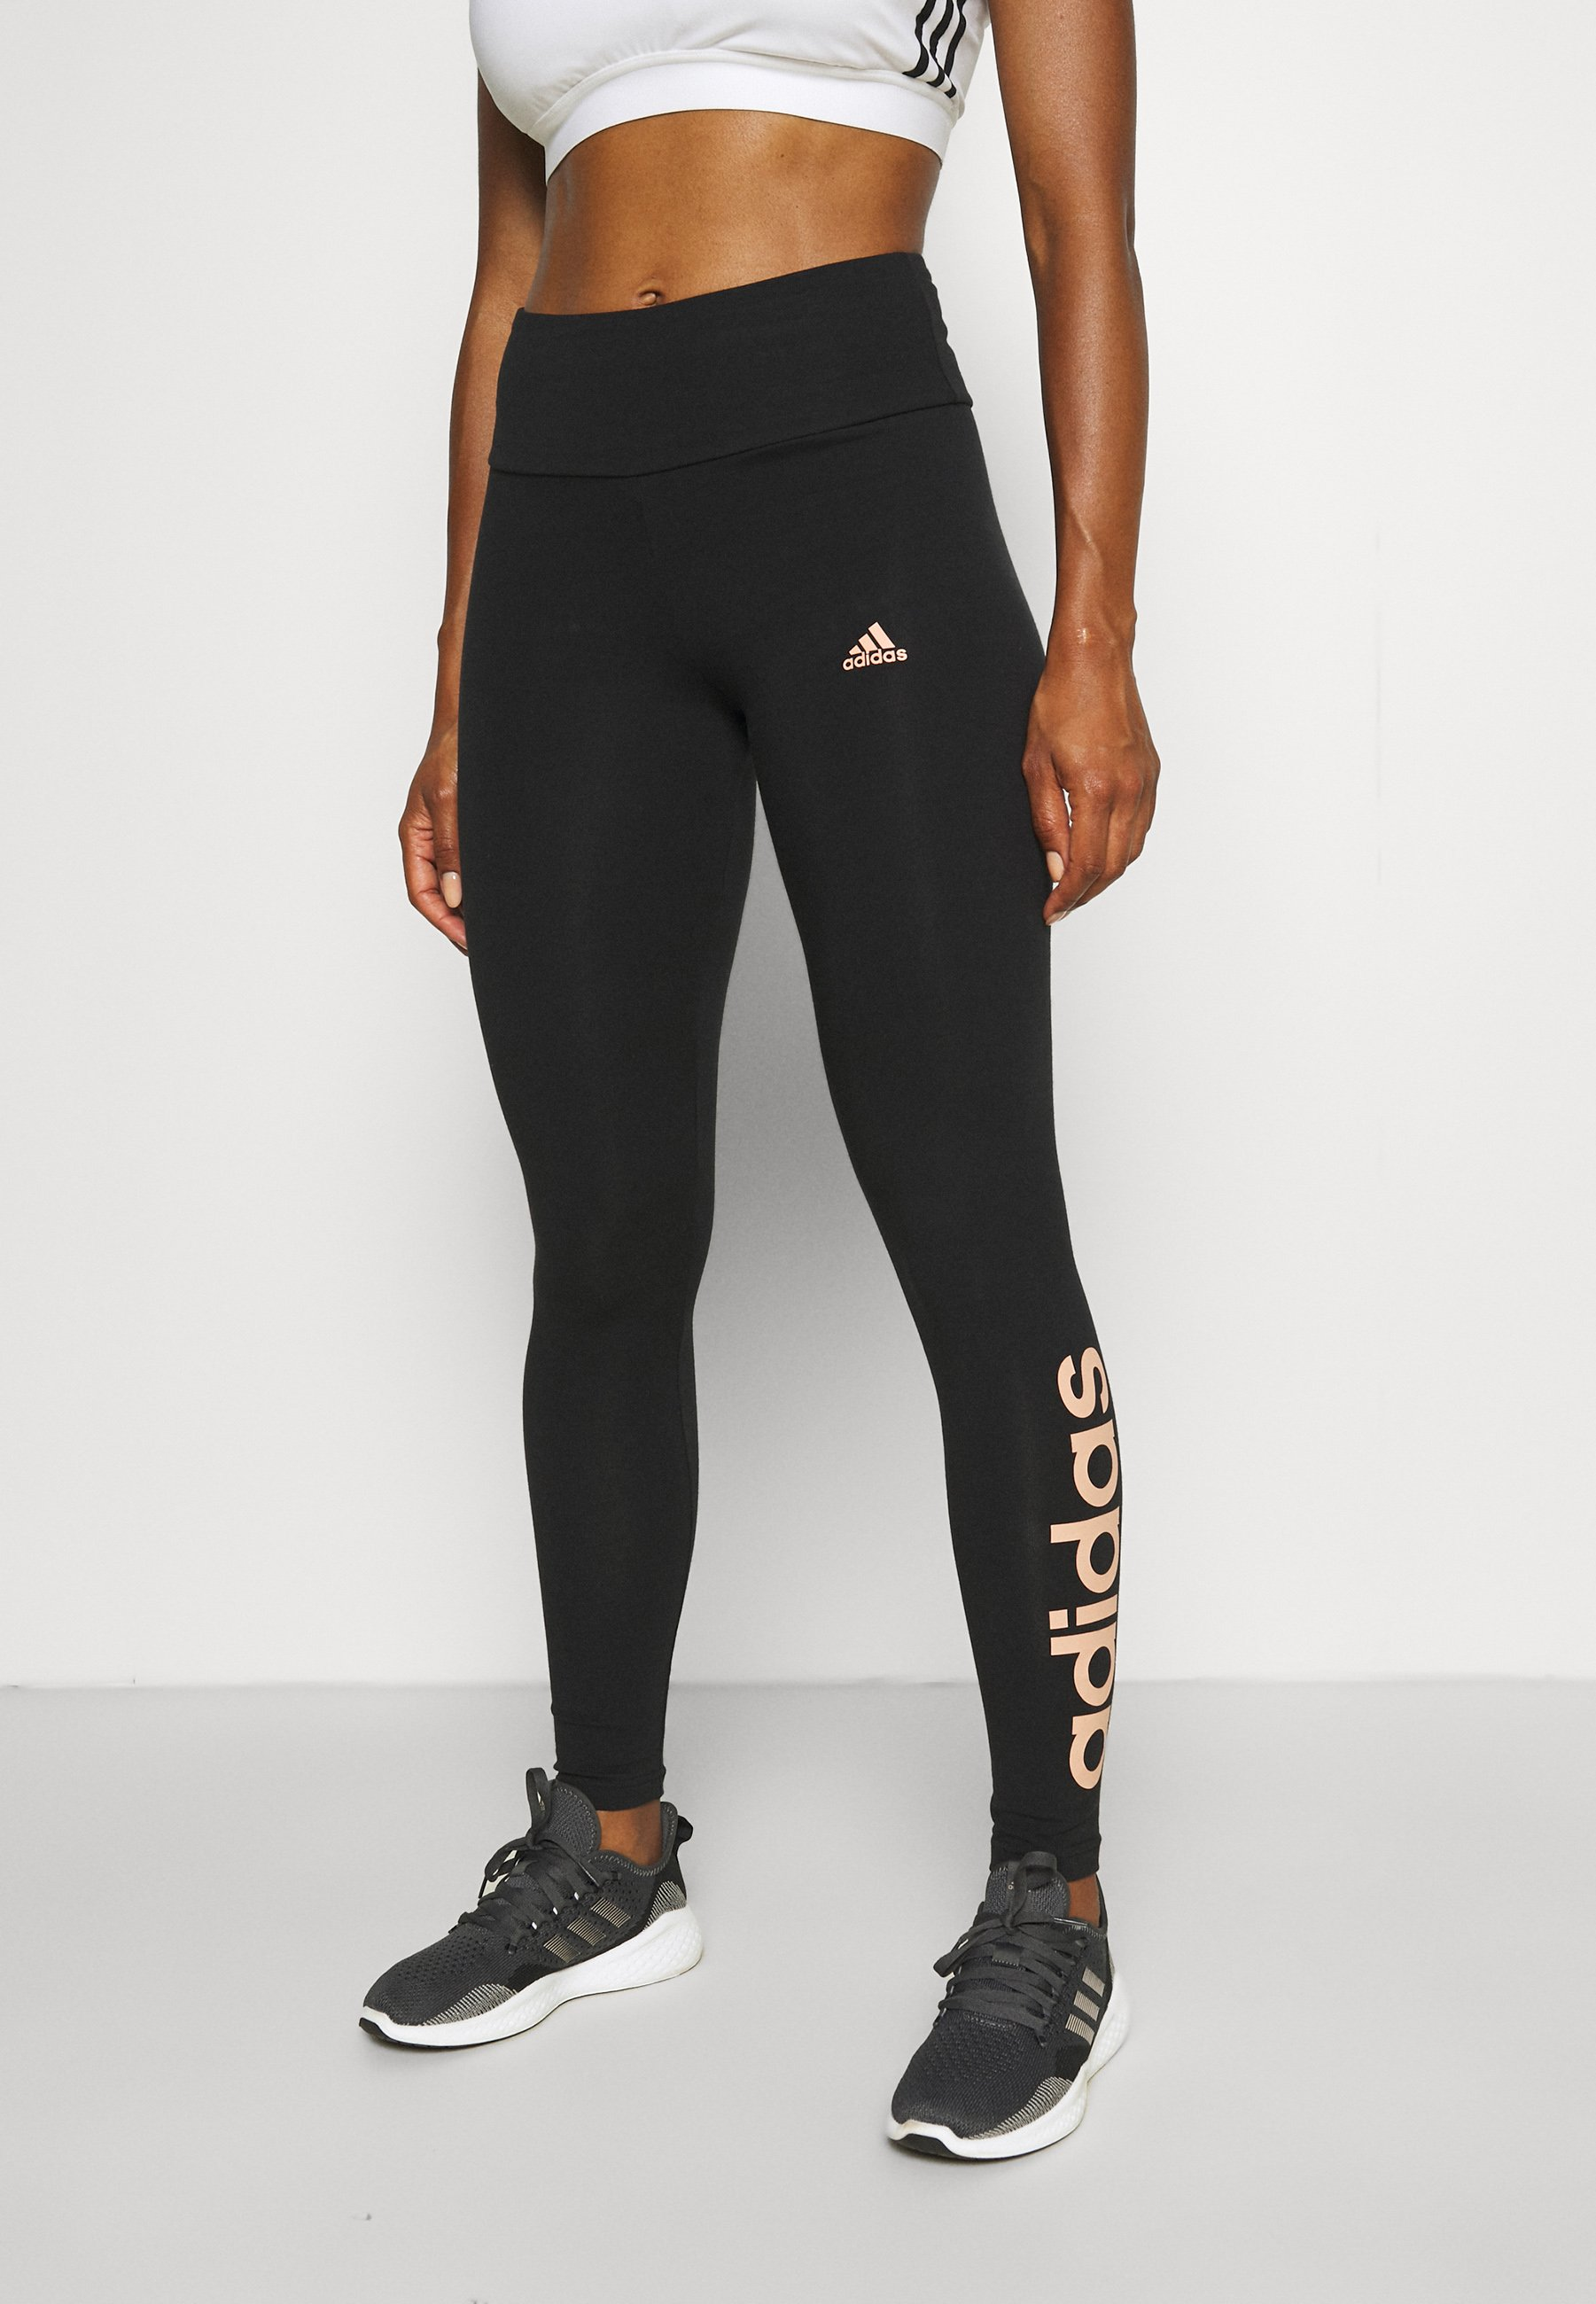 Femme LOUNGEWEAR ESSENTIALS HIGH-WAISTED LOGO LEGGINGS - Collants